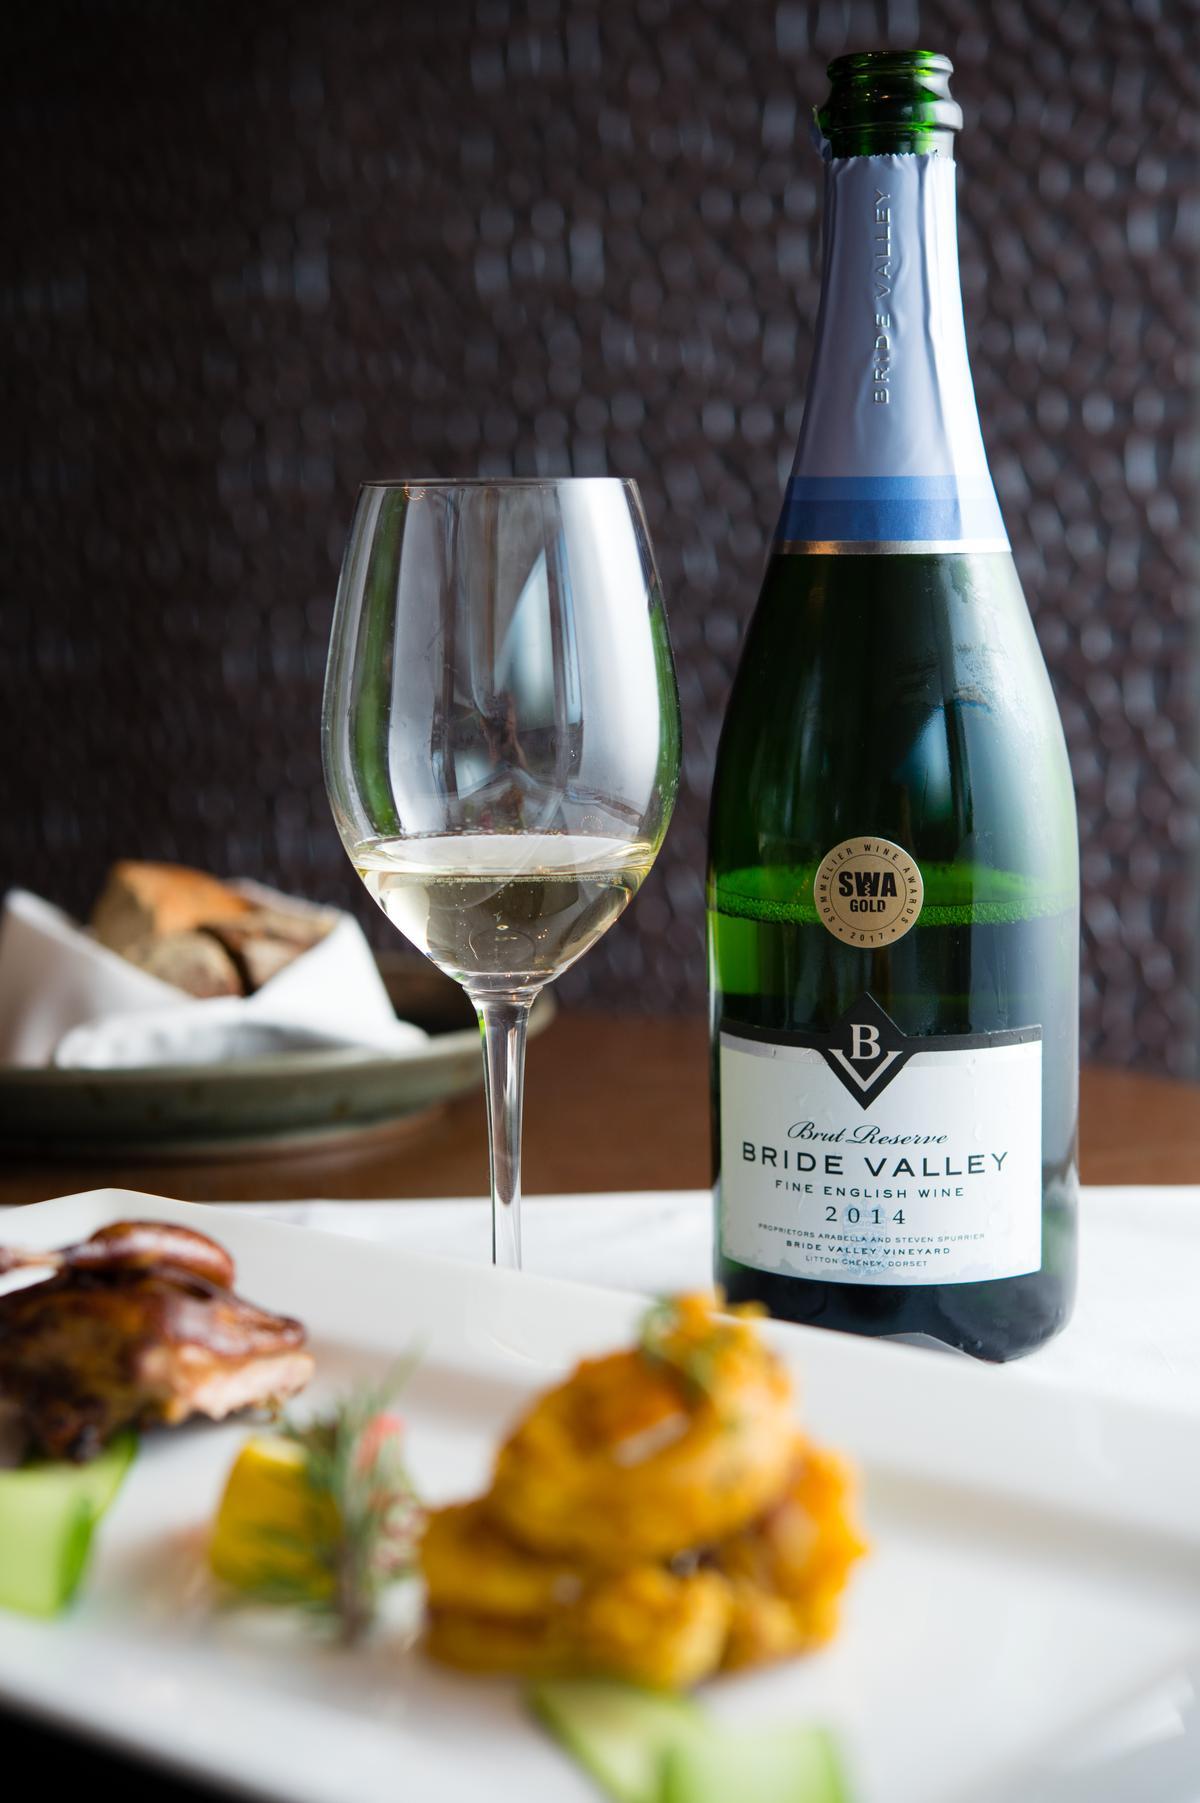 「Bride Valley Brut Reserve 特級年份氣泡酒 2014」酒色金黃,帶有青蘋果與一絲礦物香氣,適合搭配濃郁的開胃菜。(2,050元/瓶)